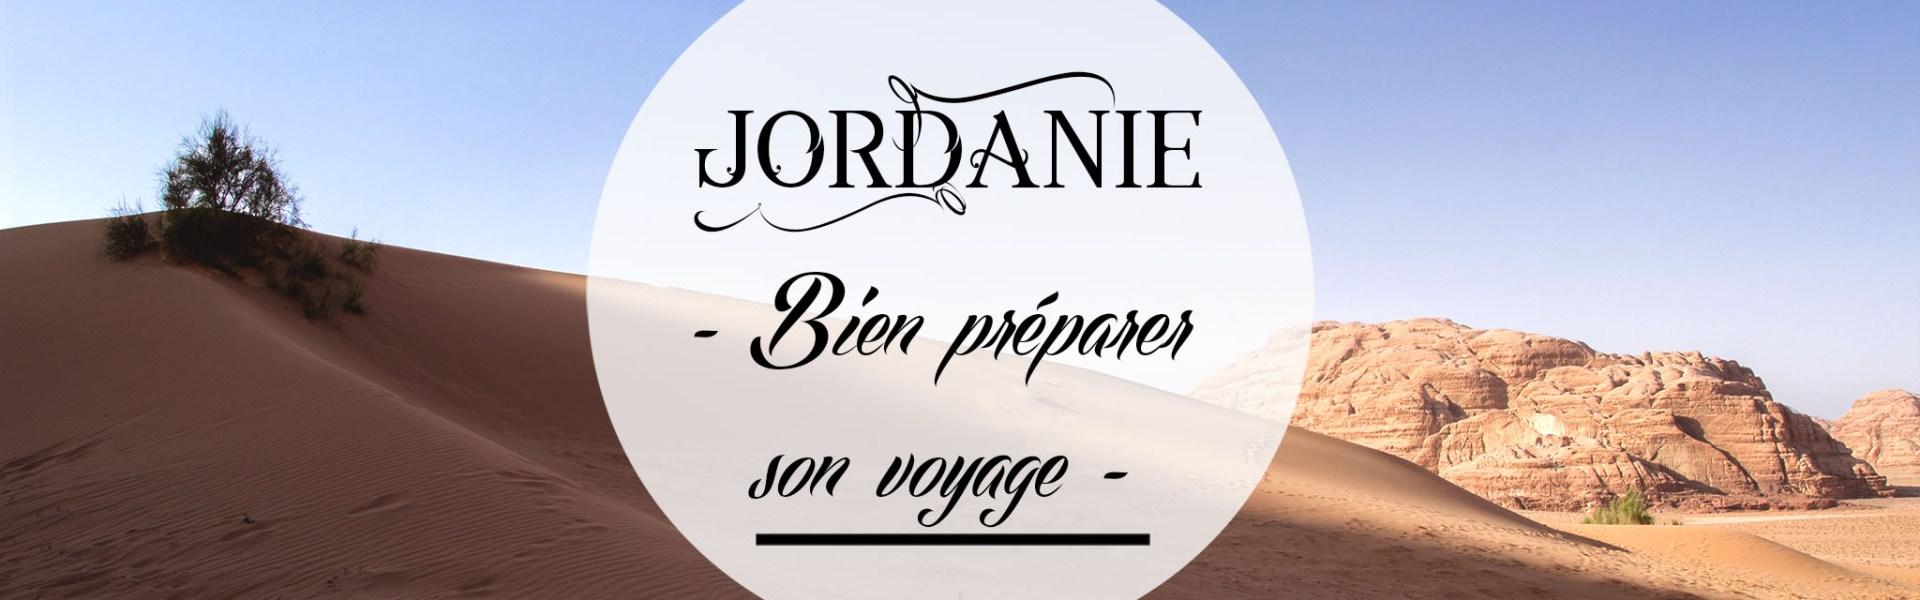 Bien préparer son voyage en Jordanie